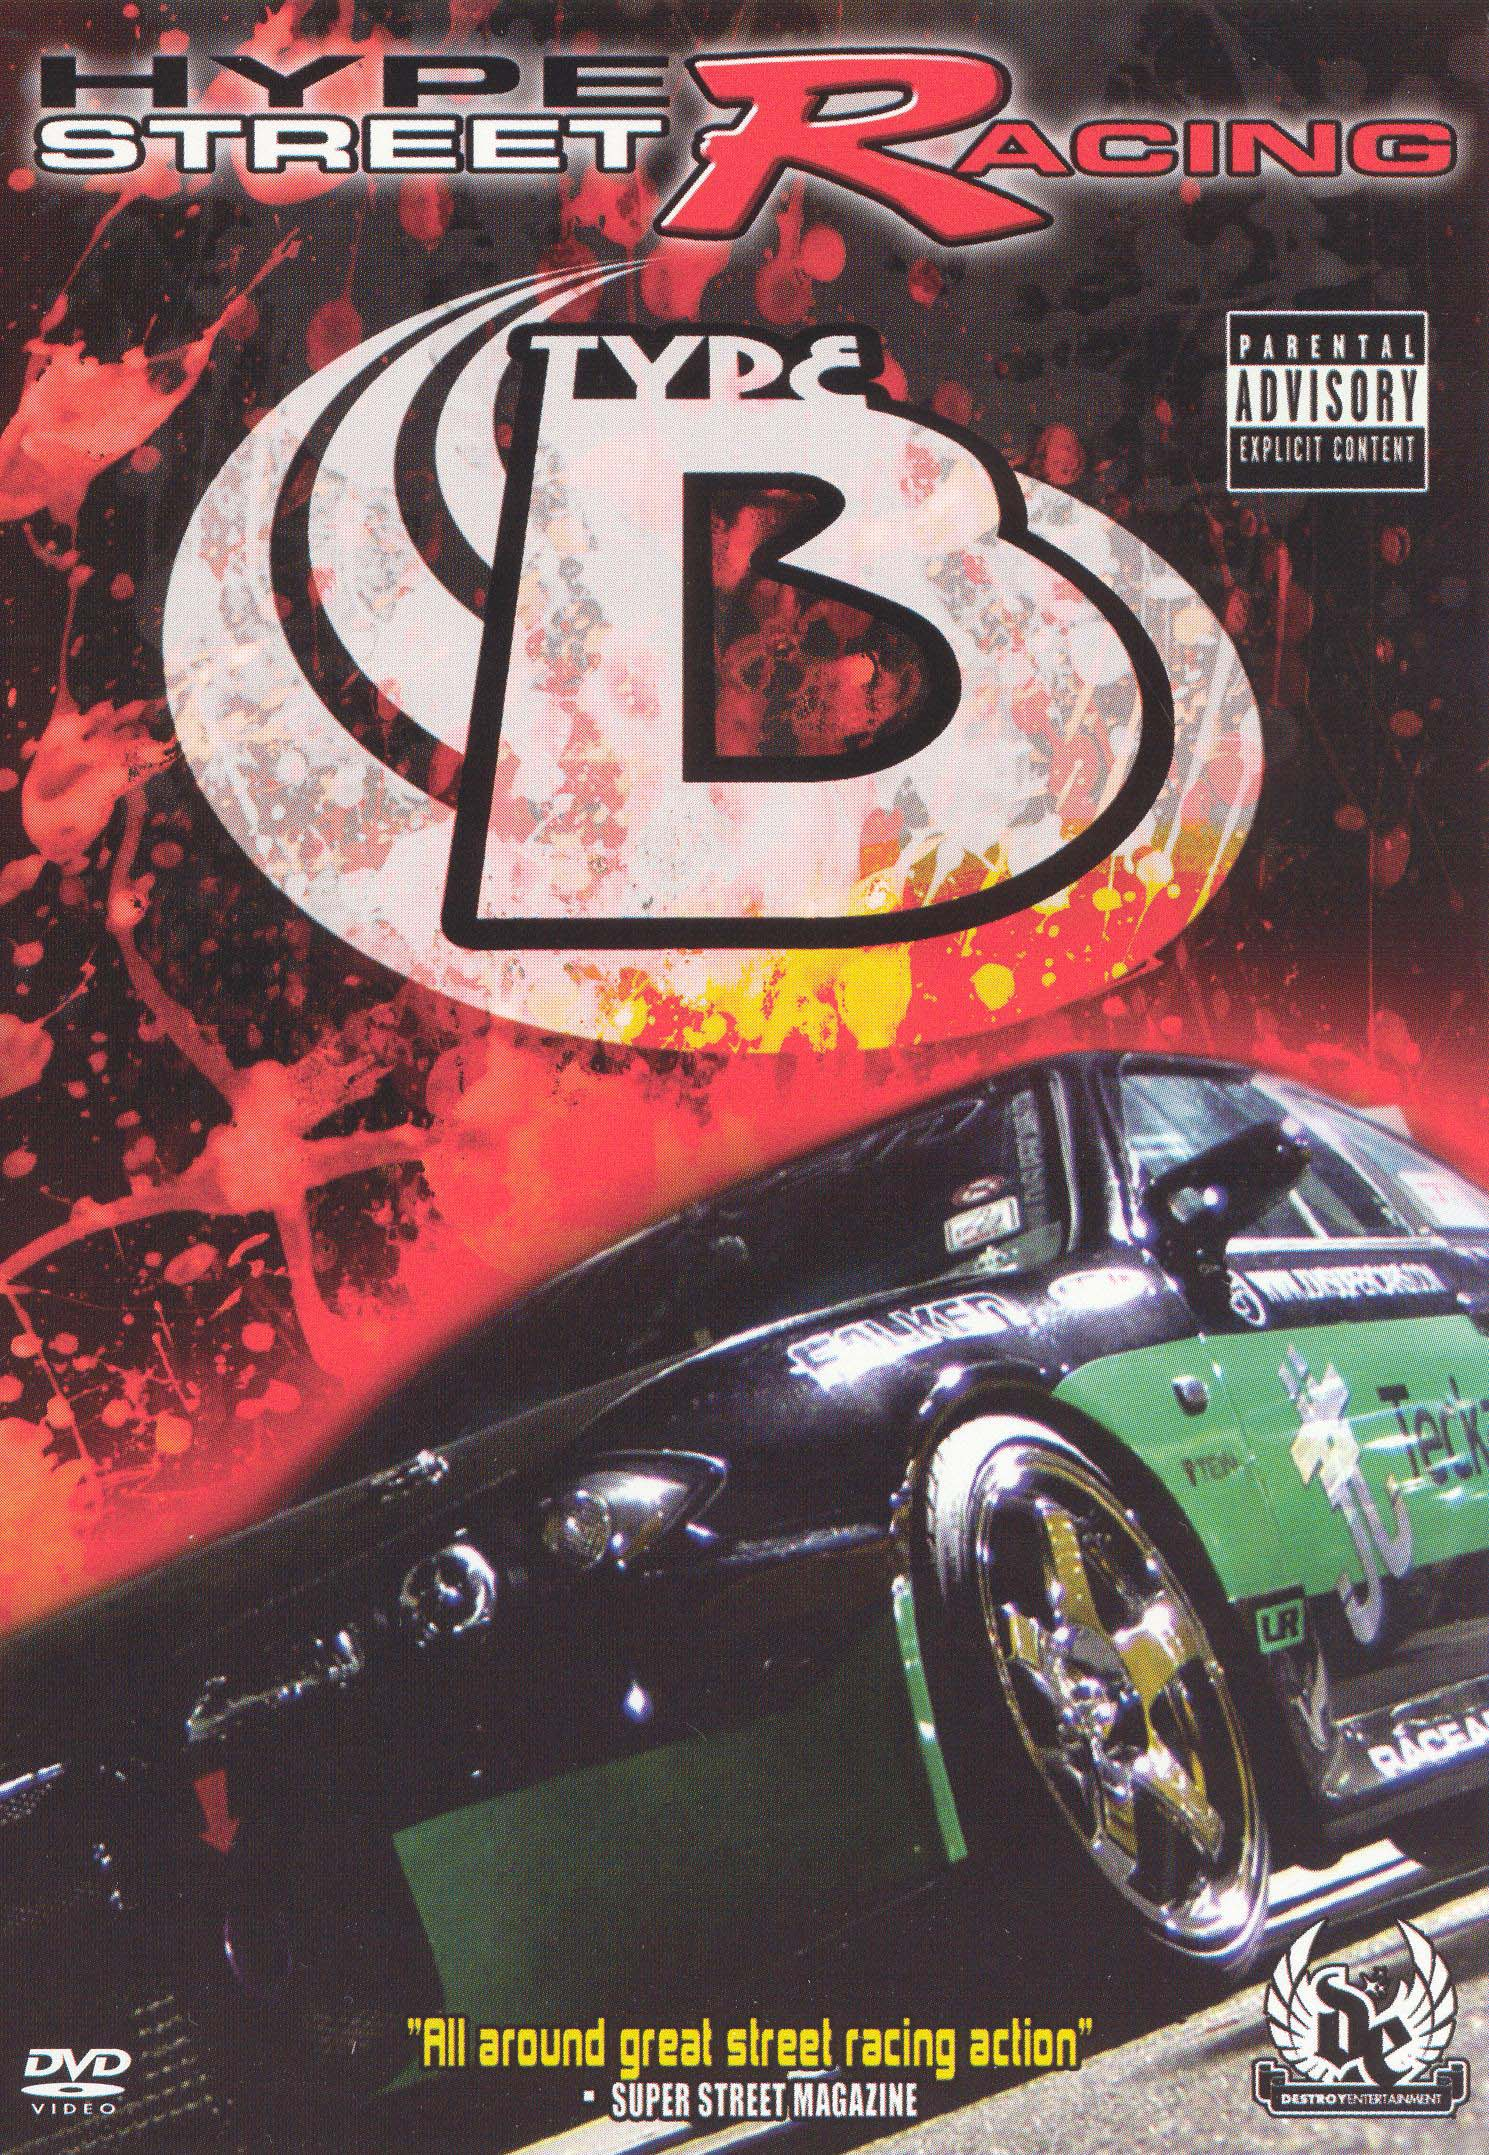 Hyper Street Racing: Type-B